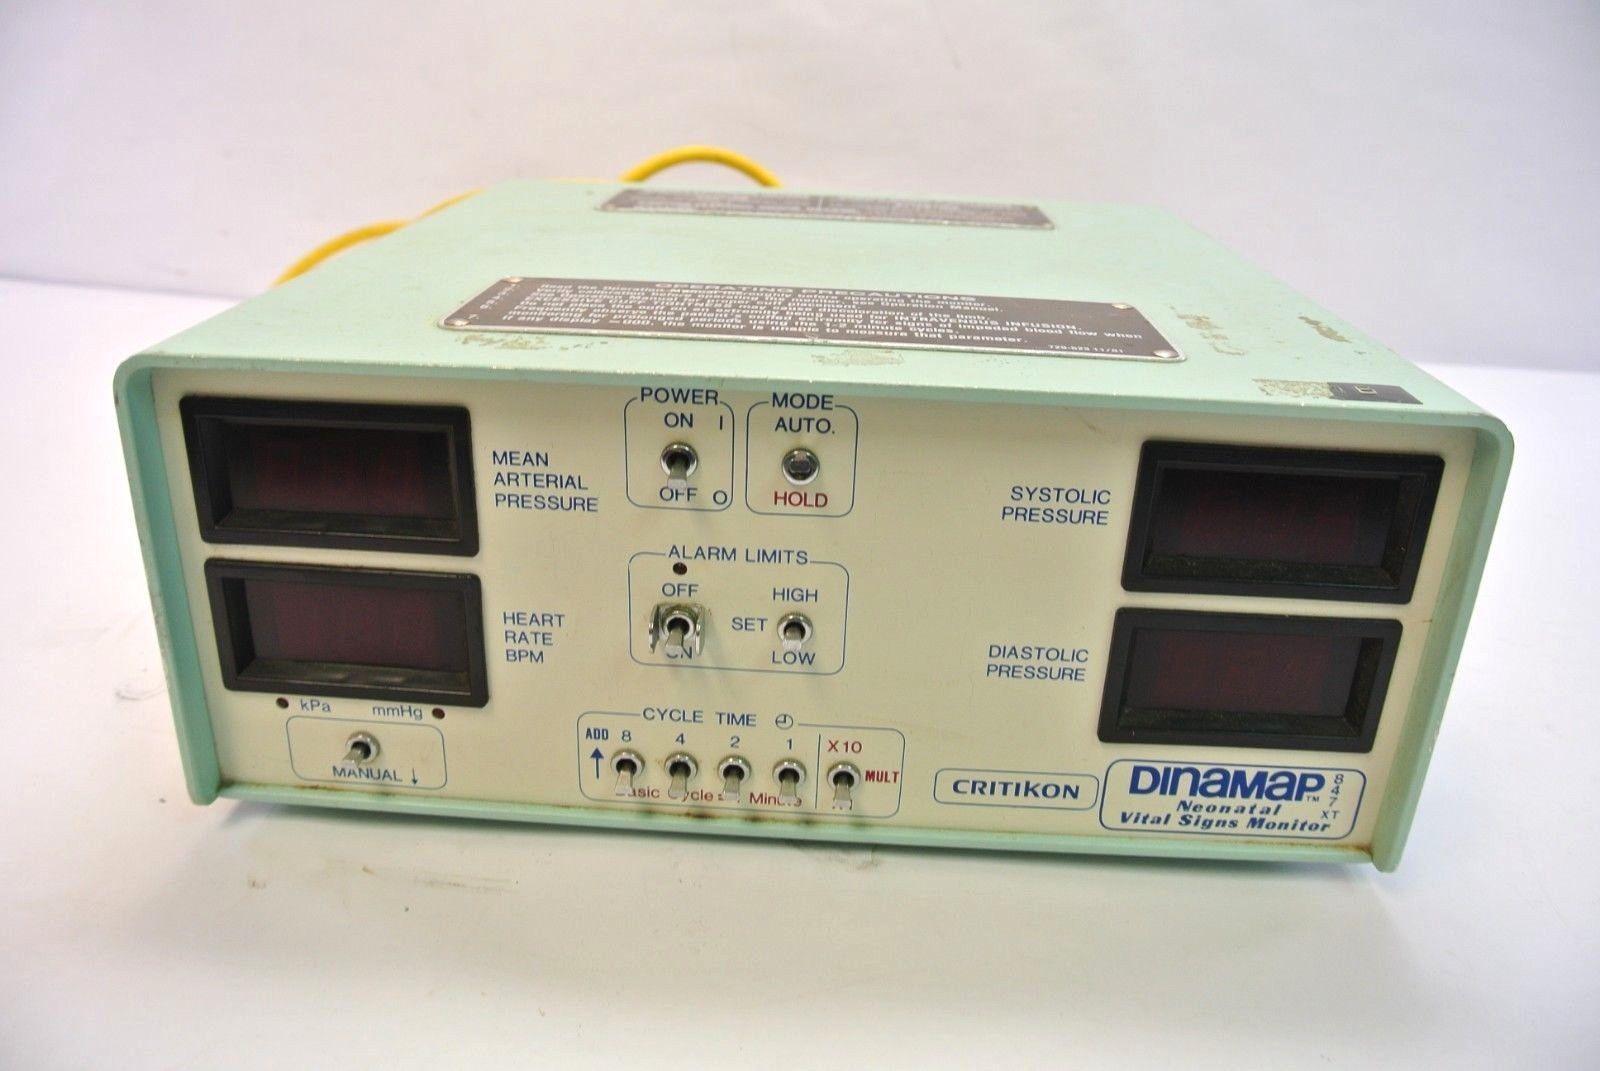 Critikon Dinamap 847XT Patient Monitor